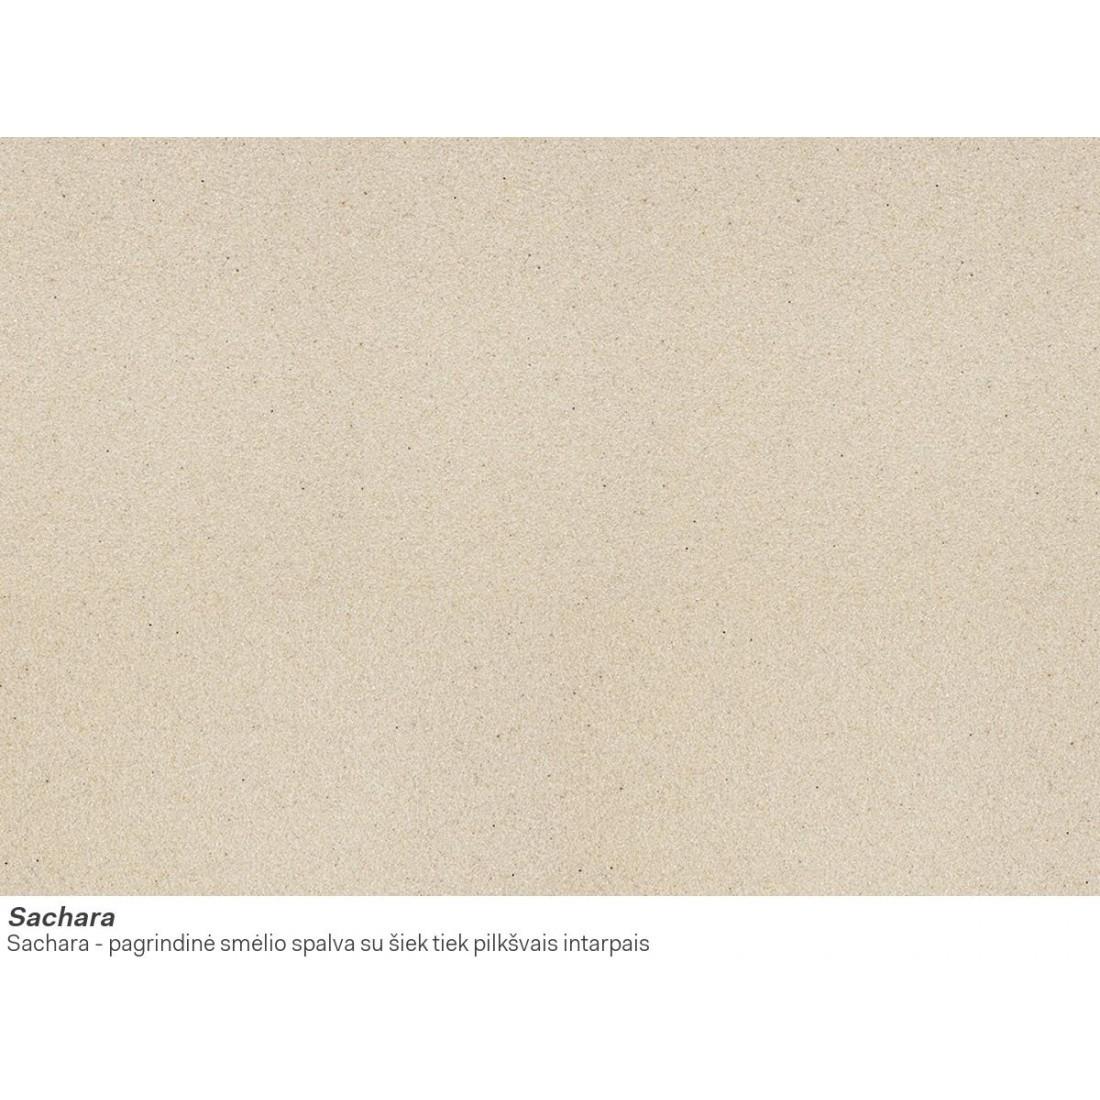 Akmens masės plautuvė Franke Ronda ROG 610-41, ekscentrinis ventilis, Sachara